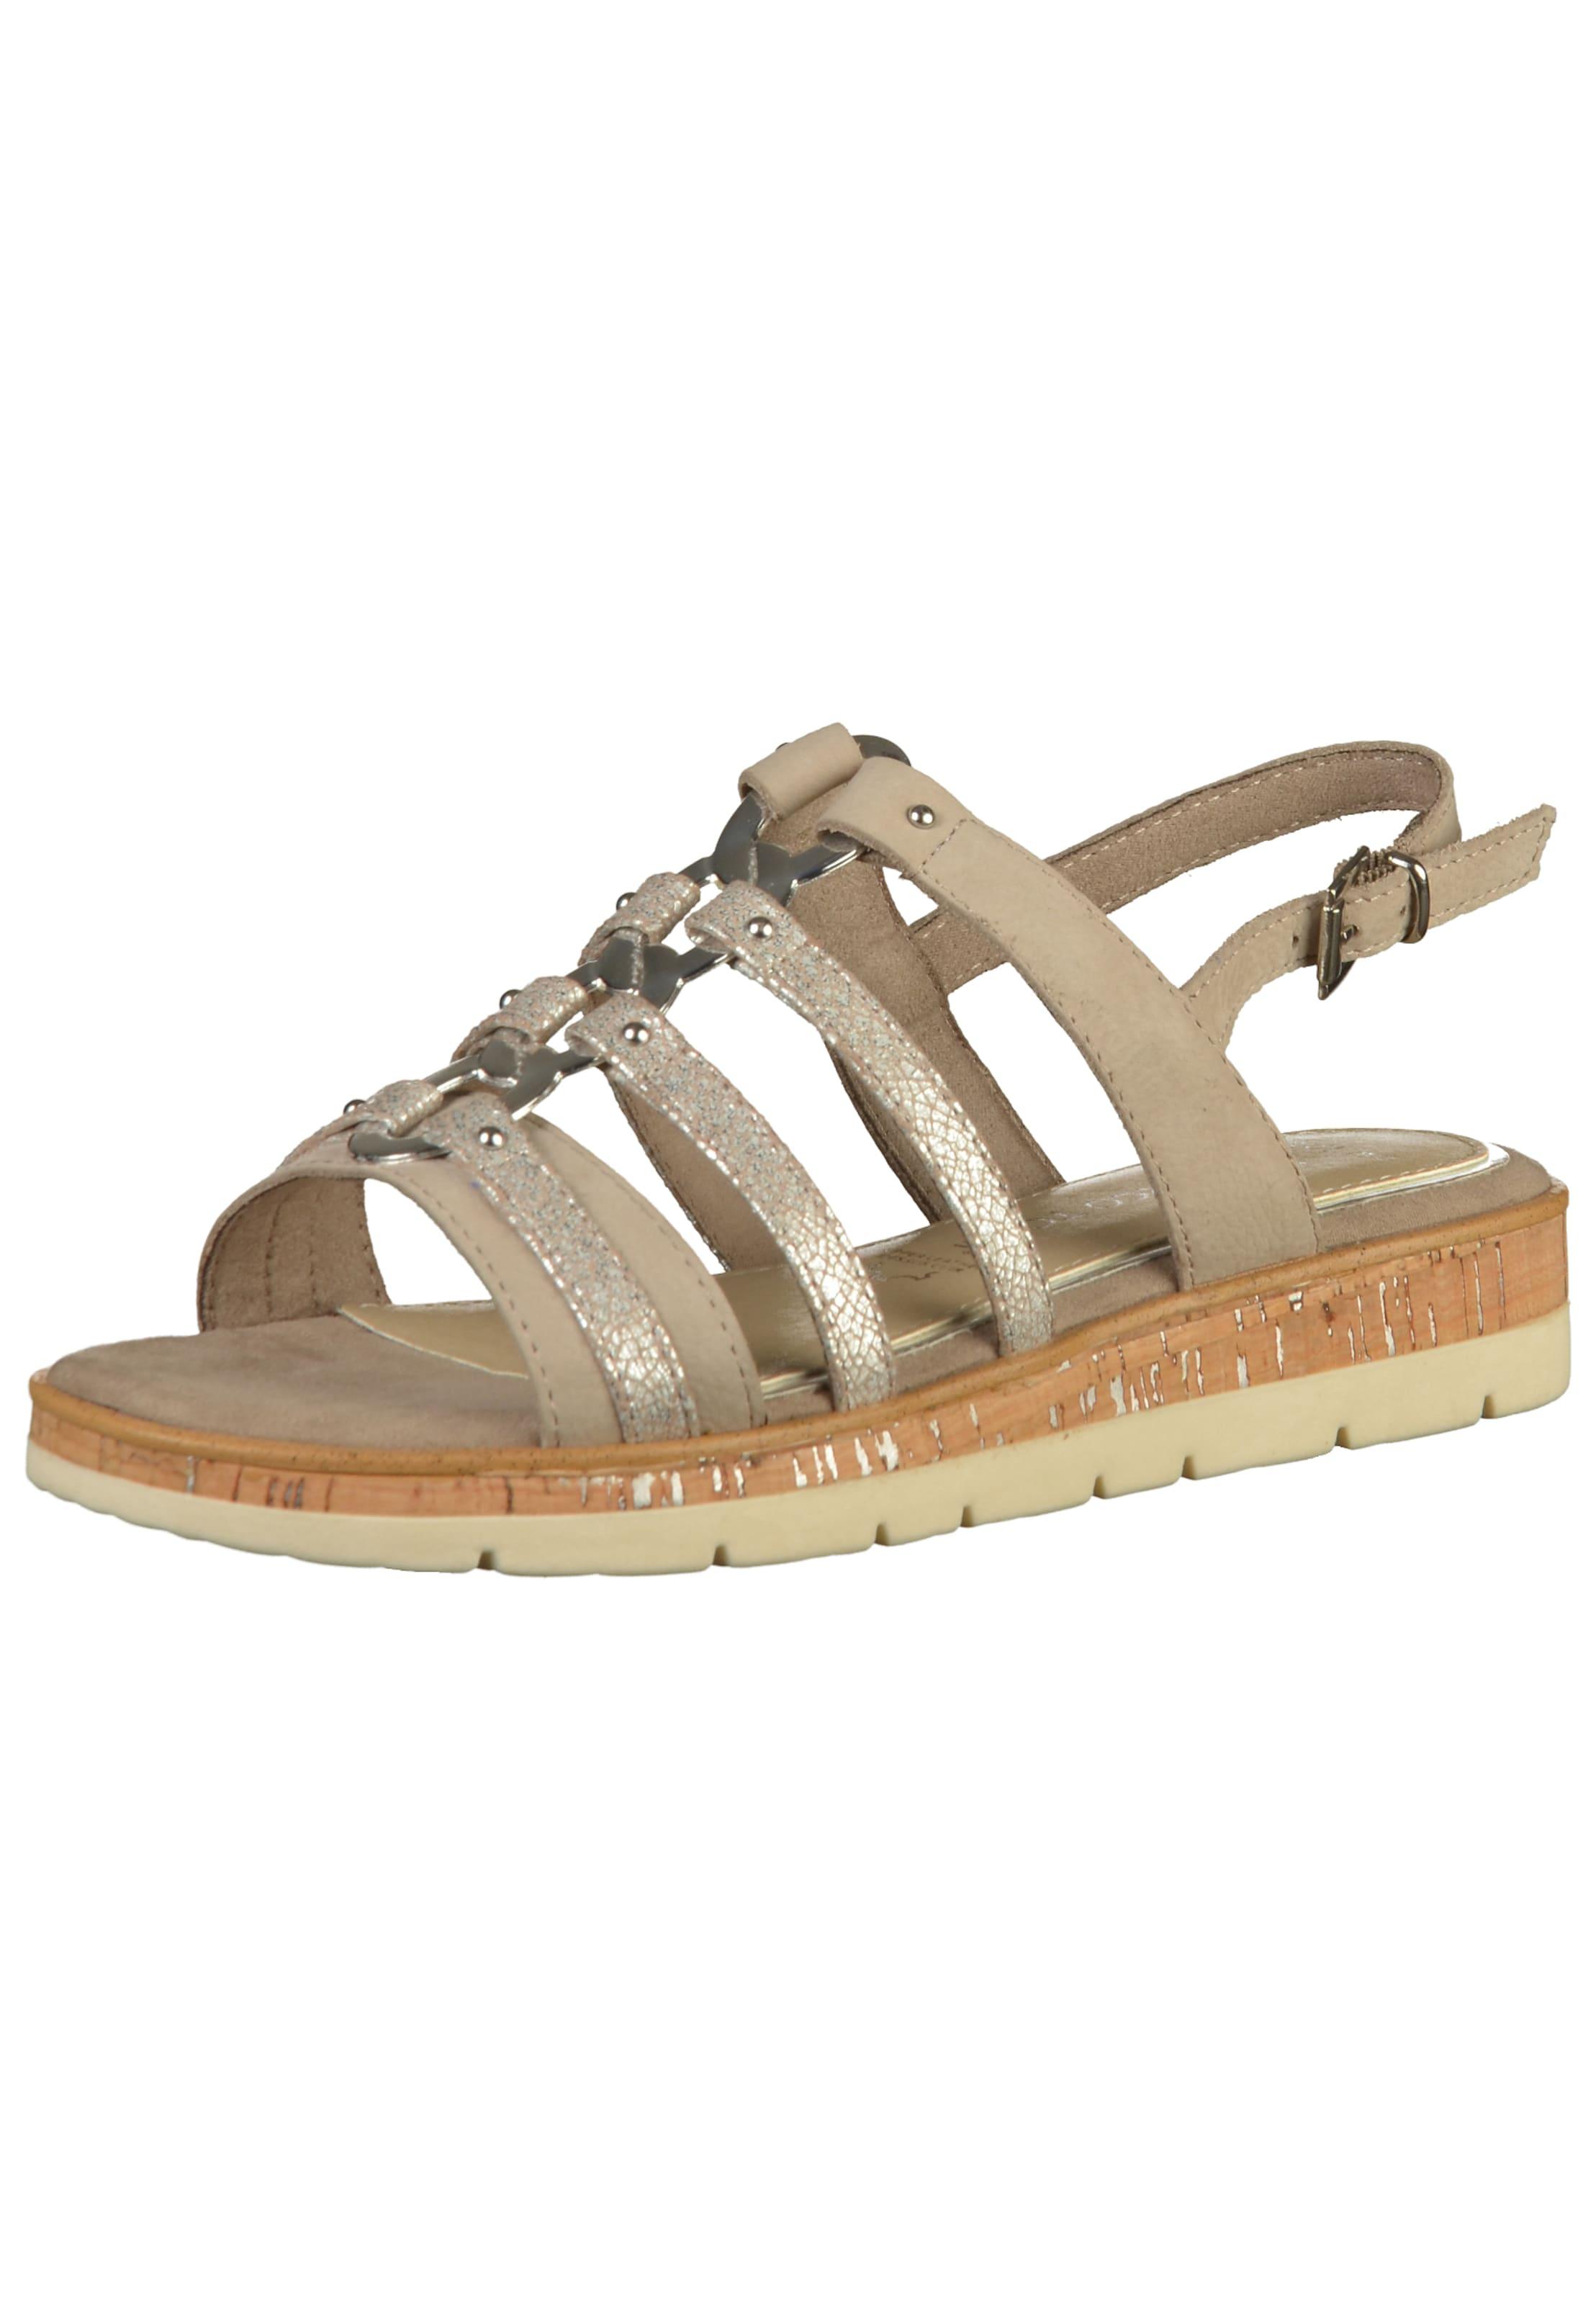 Haltbare Mode billige Schuhe MARCO TOZZI   Sandalen Schuhe Gut getragene Schuhe